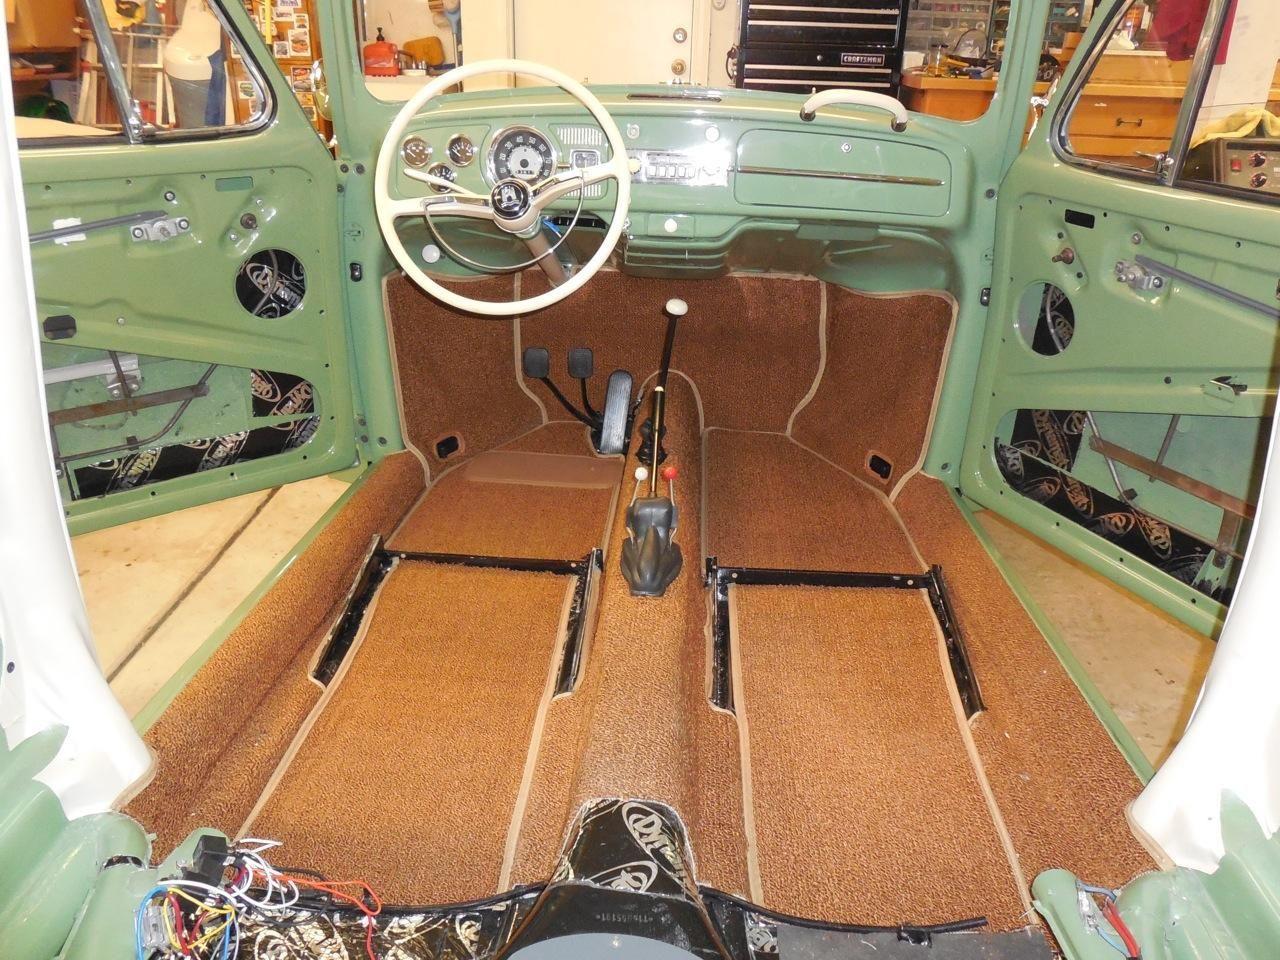 Volkswagen Bug Agave Green Project Carpet Sewfine Volkswagenbrasilia Vw Bug Interior Volkswagen Vintage Volkswagen